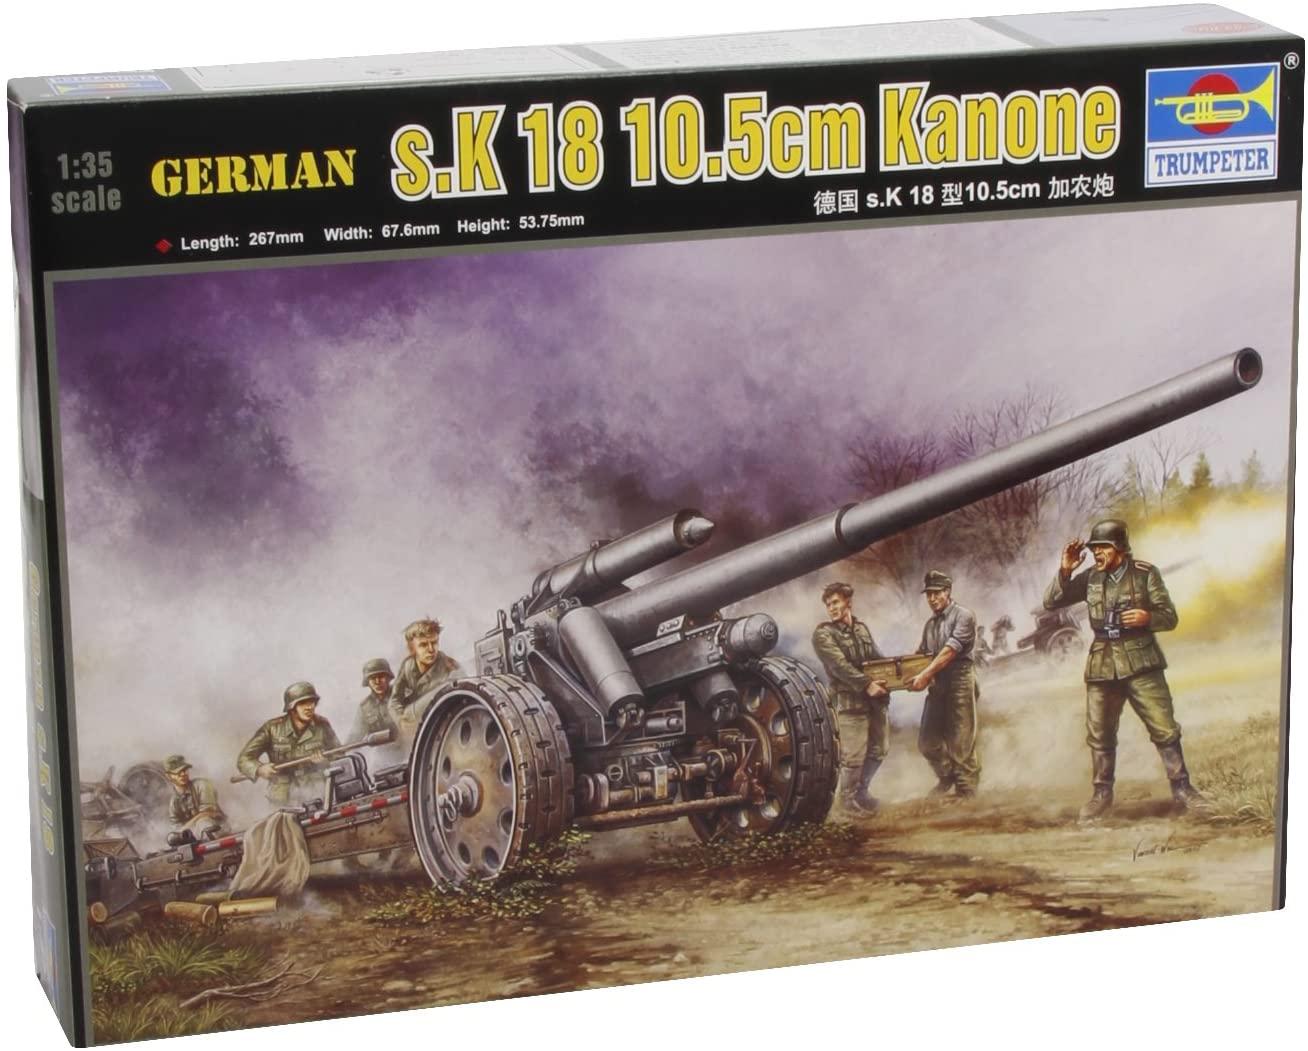 Trumpeter 1/35 German 10.5cm s.K 18 Heavy Artillery Gun Model Kit